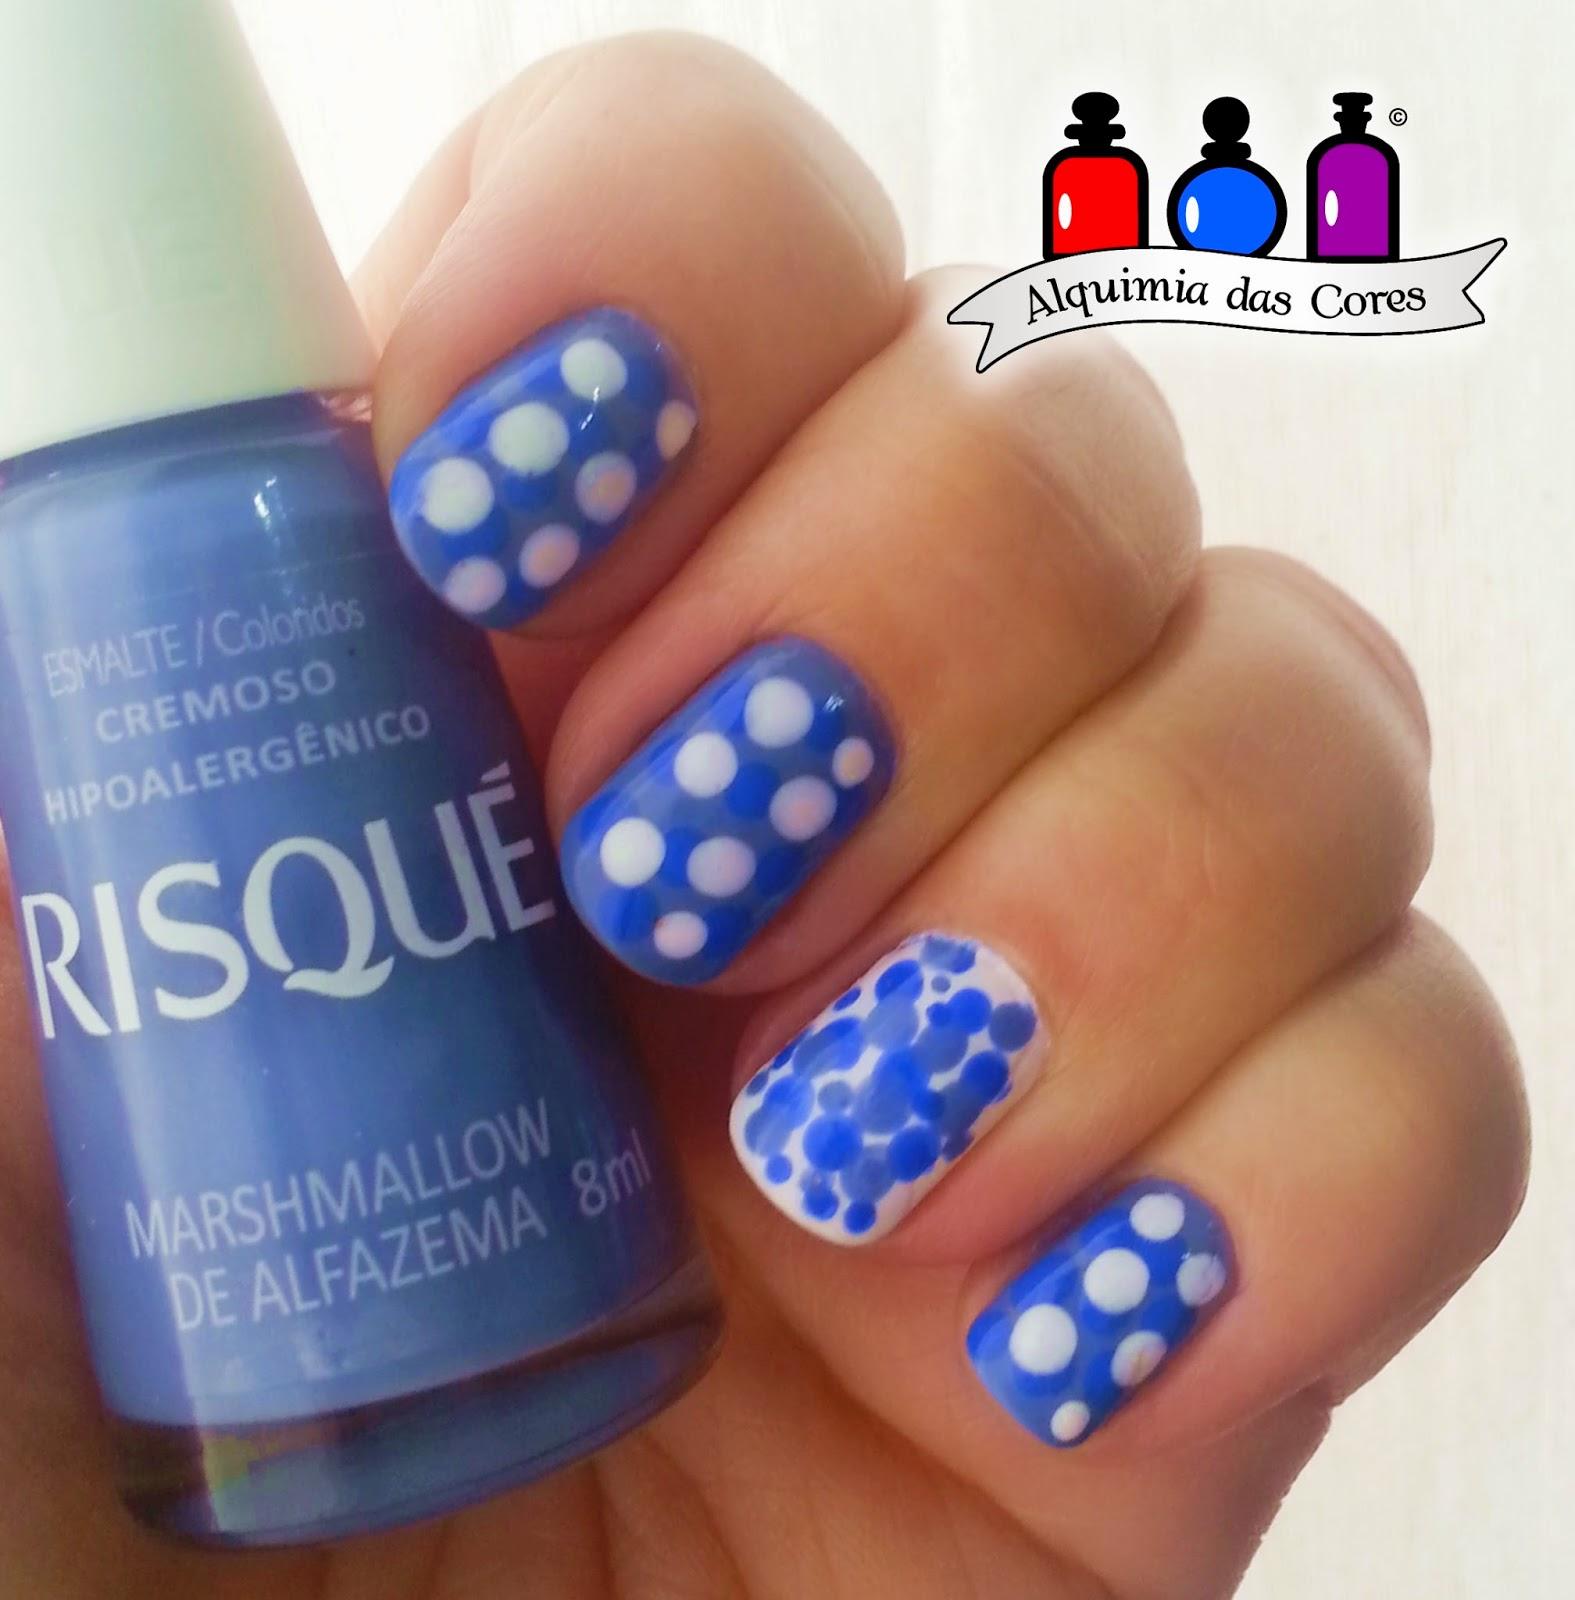 Arii Goes, azul, bourjois, branco, lilás, poá, risqué